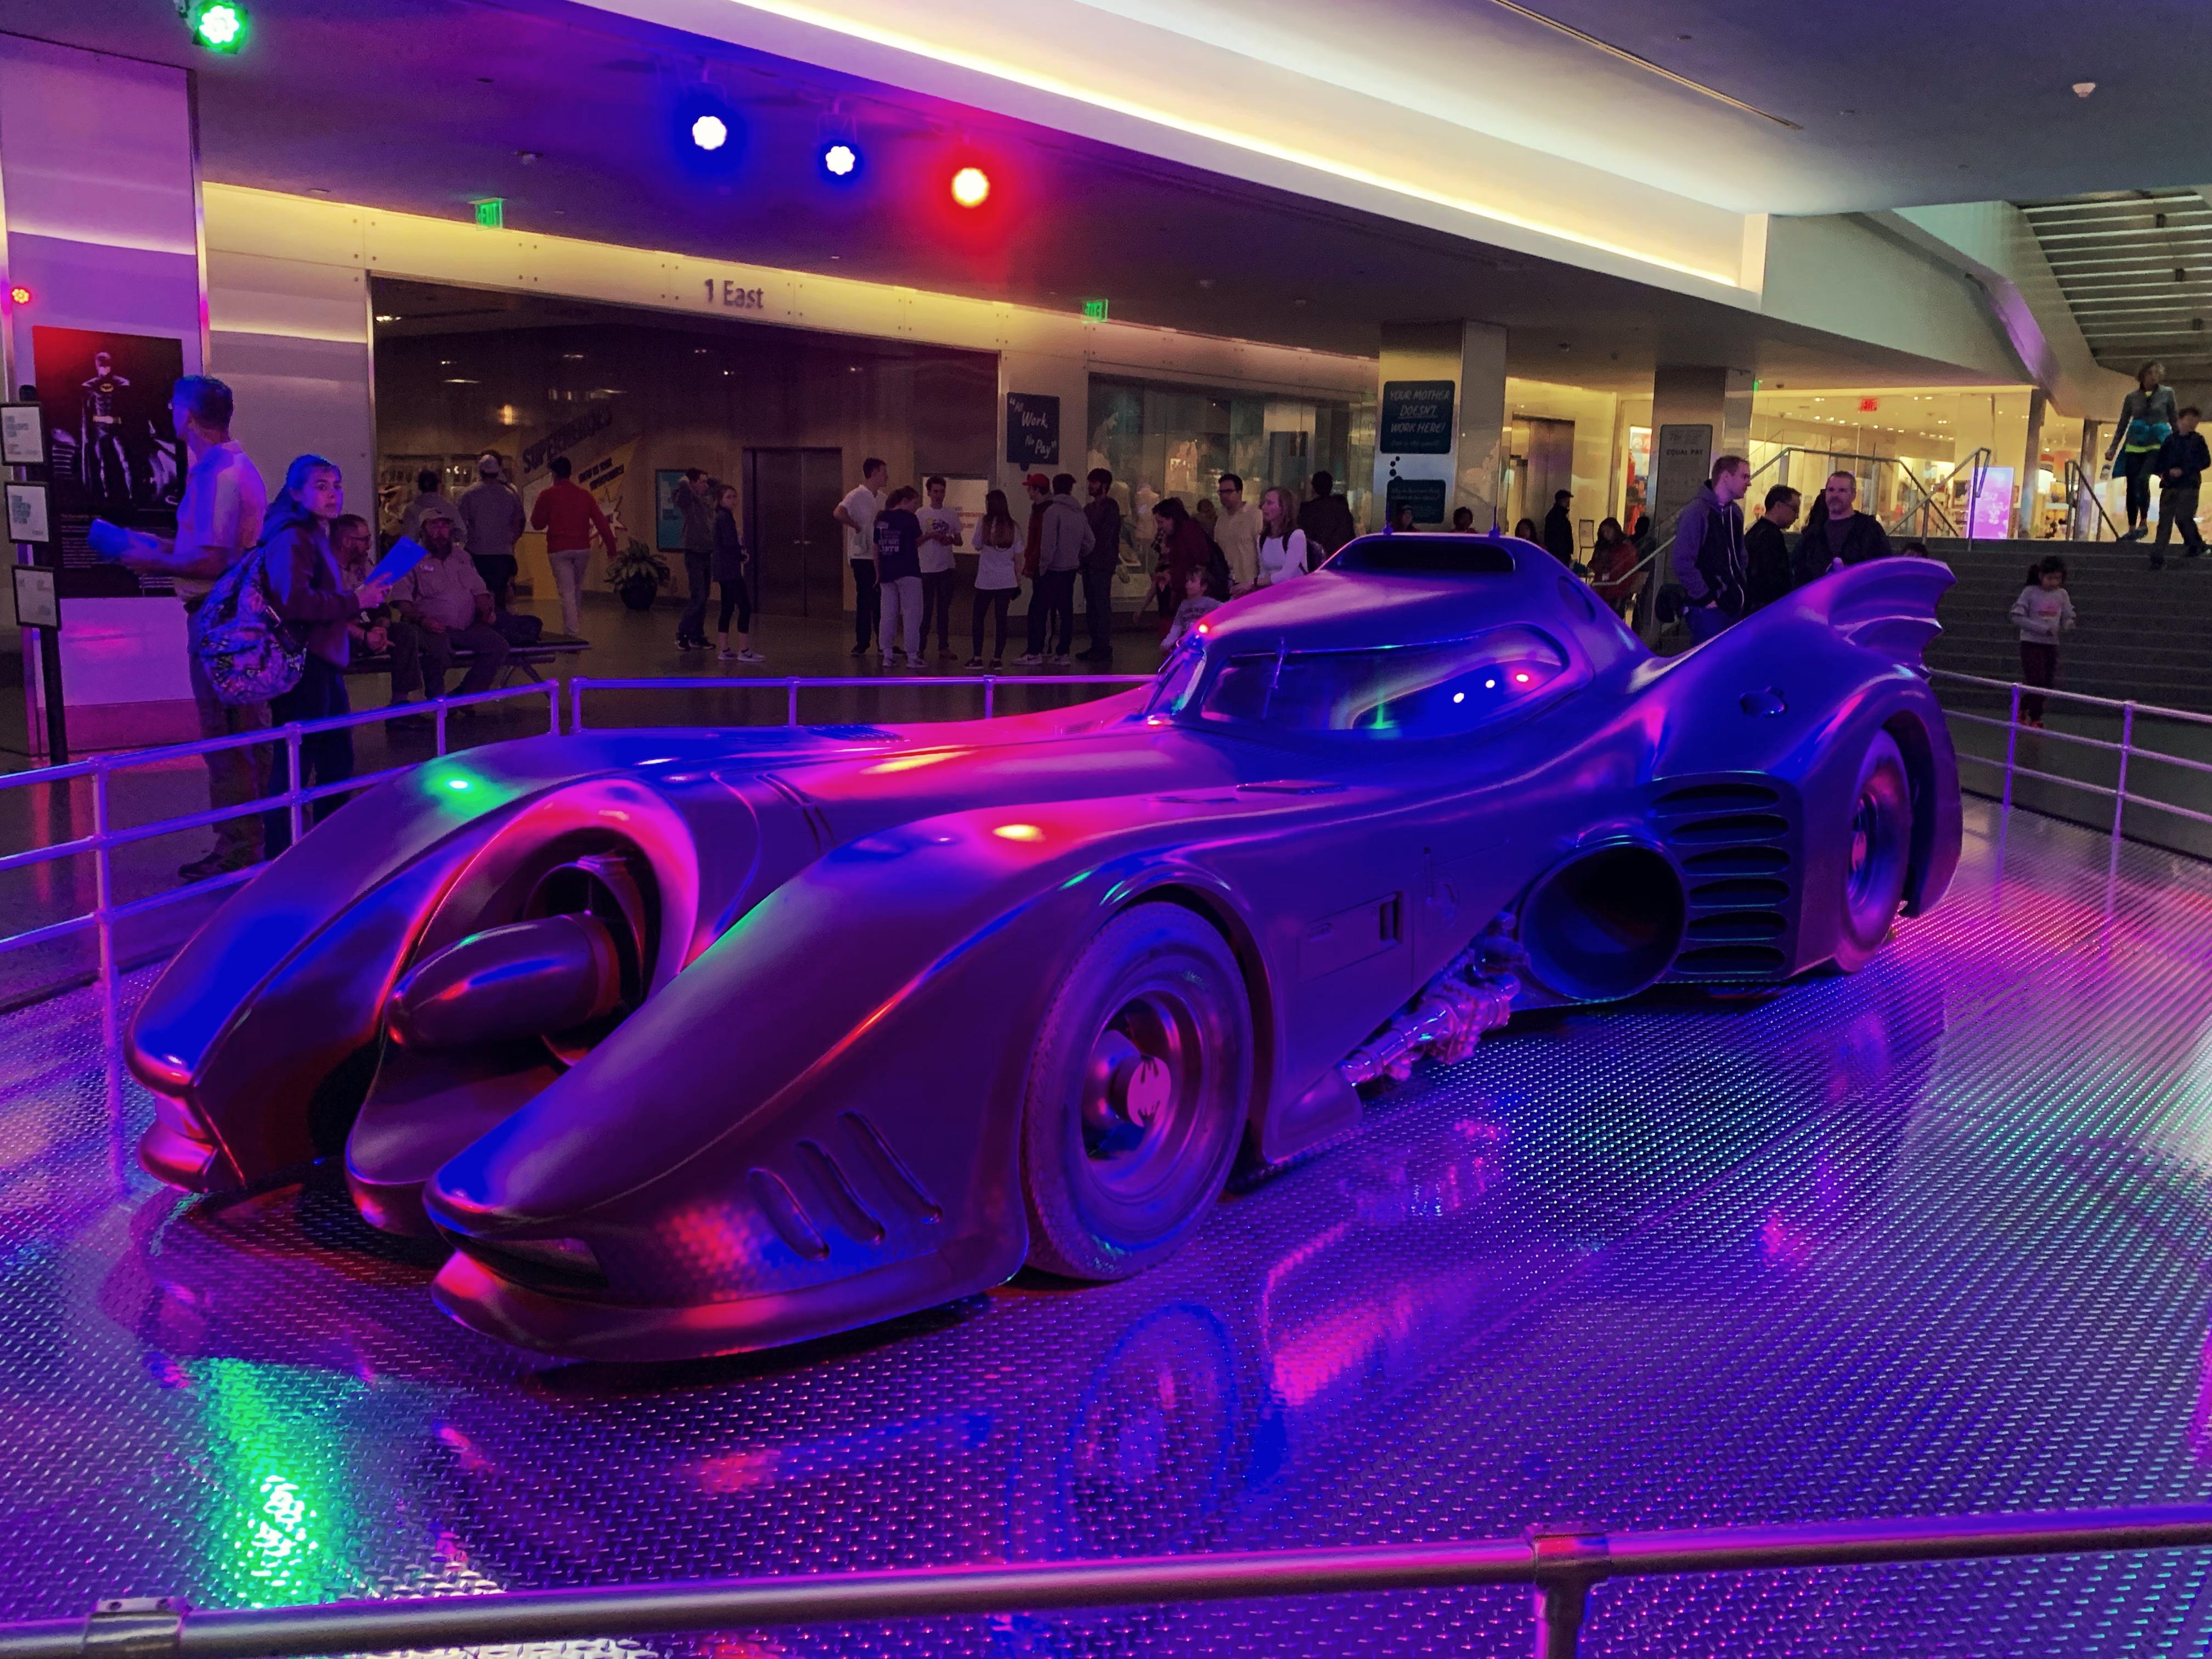 Batmobile at the Smithsonian's Superhero Exhibit